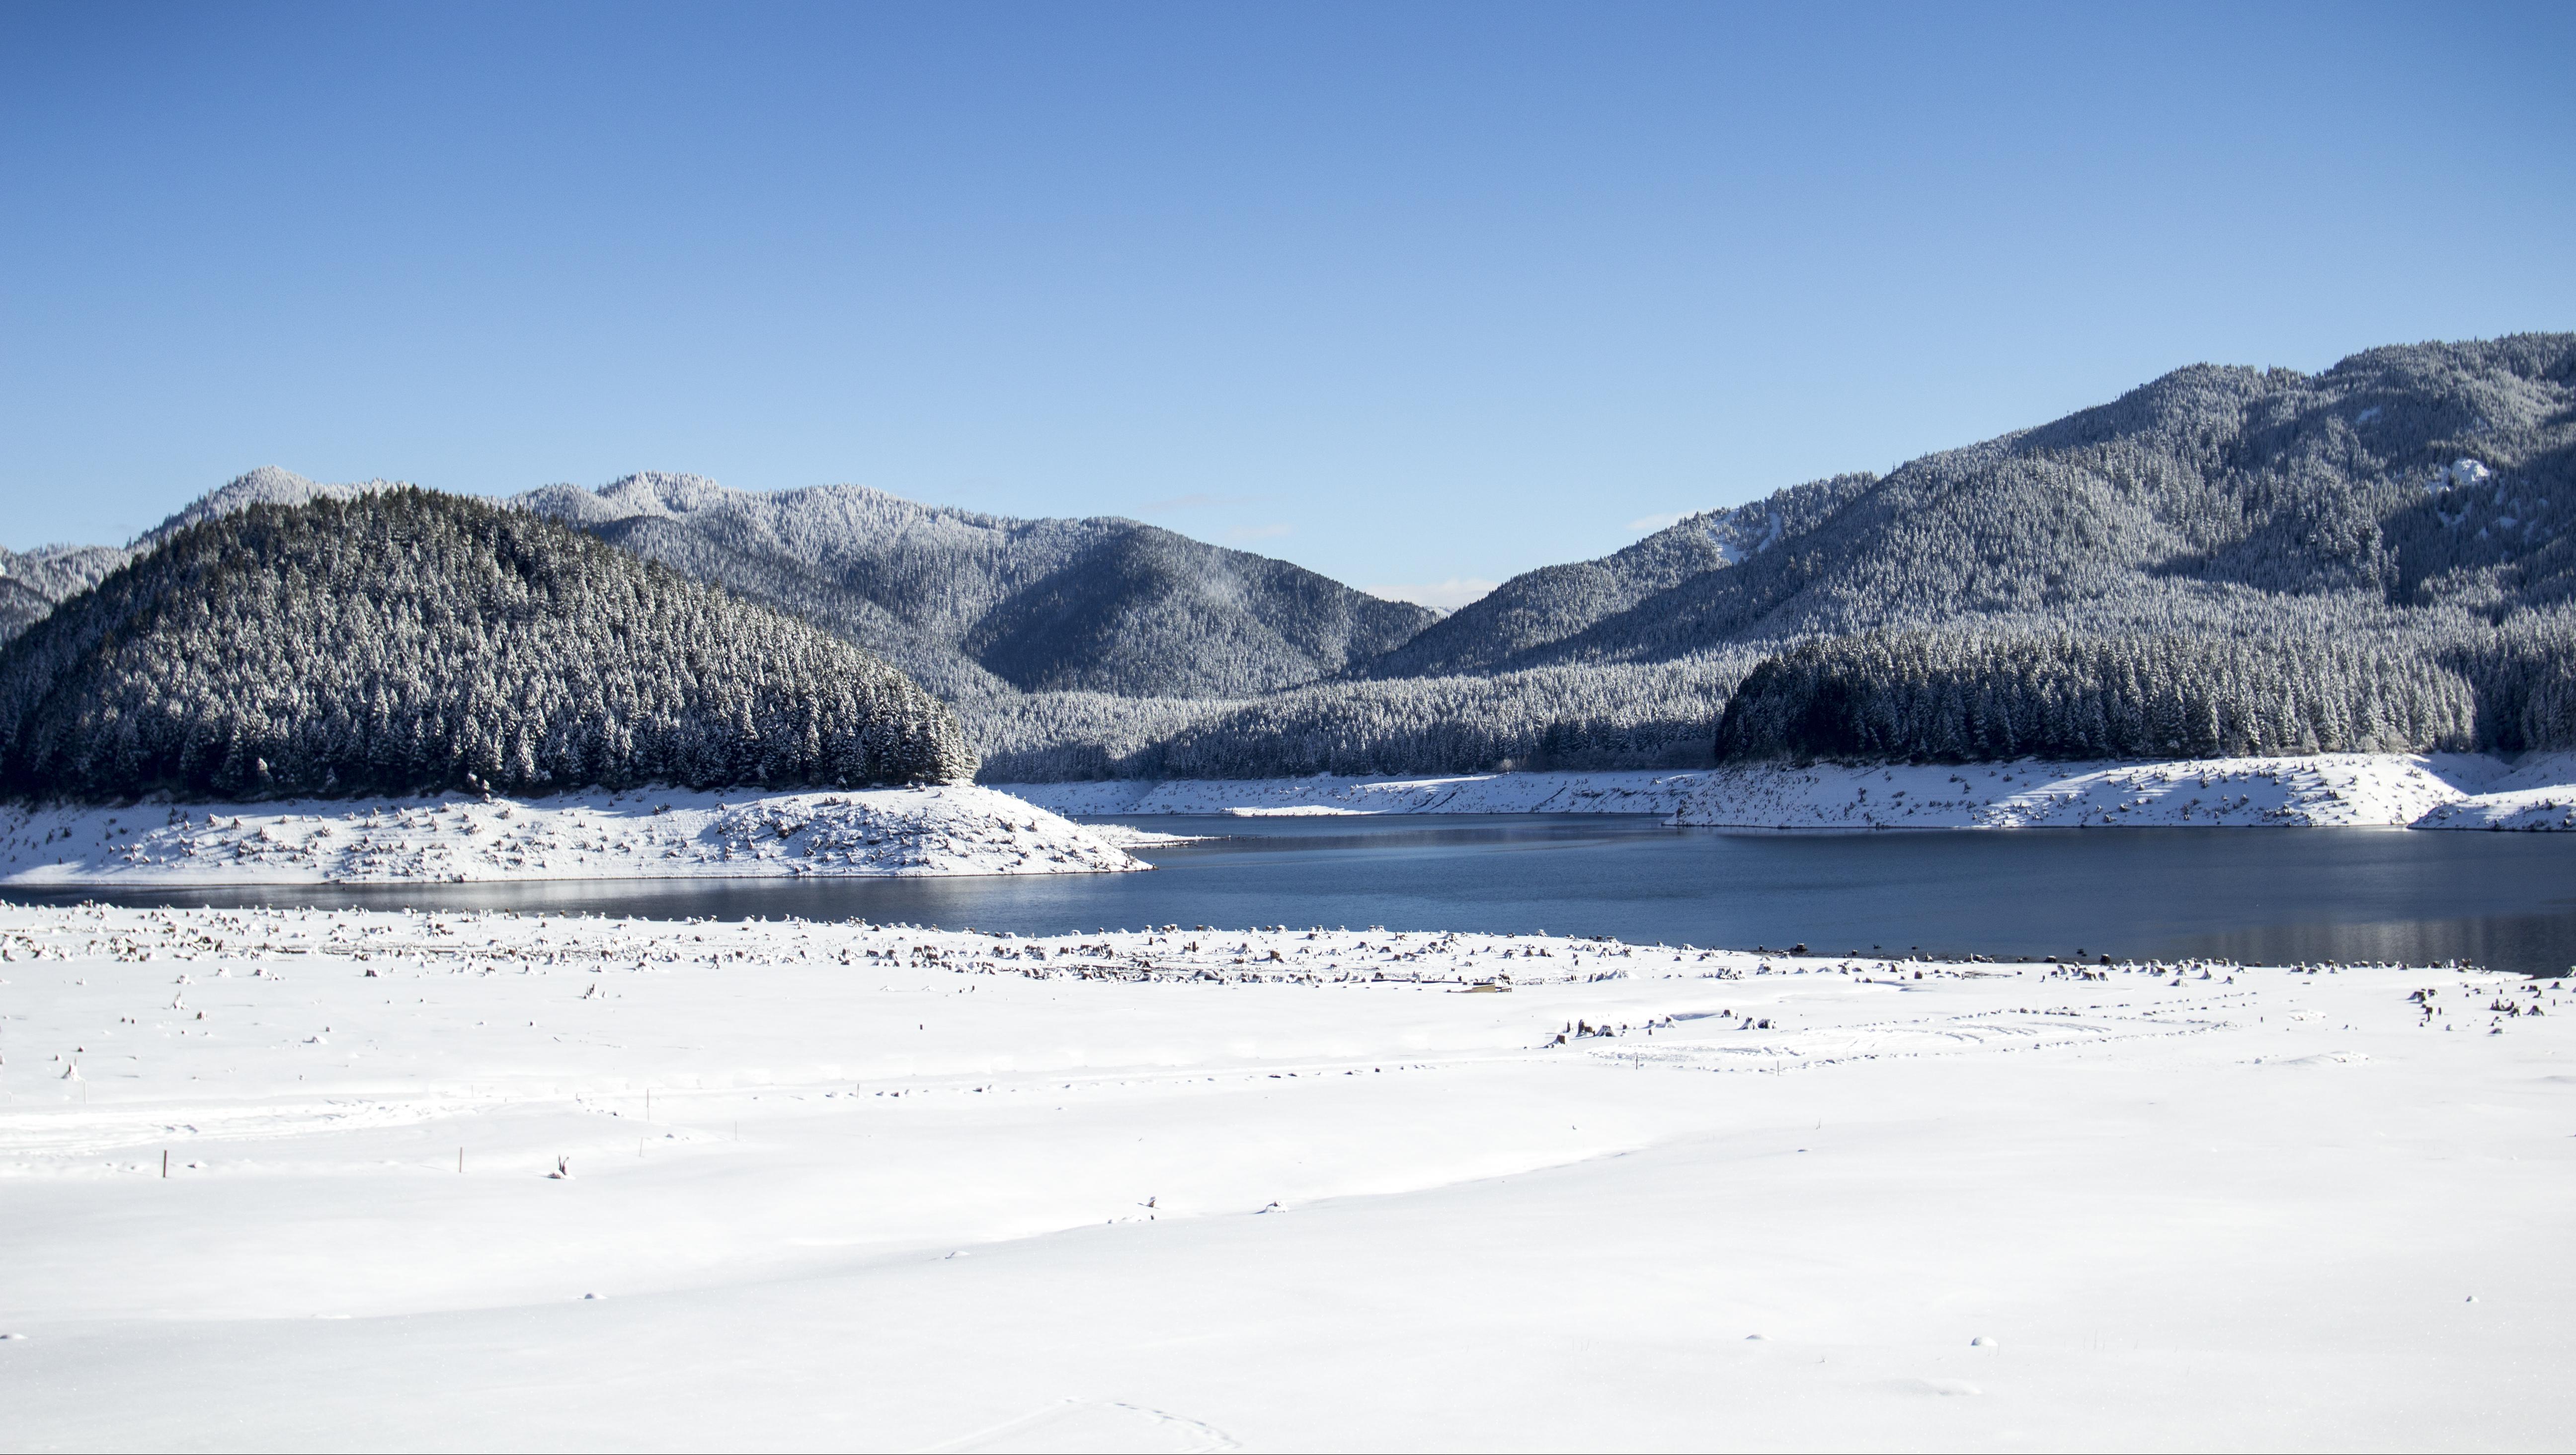 Detroit Lake in winter, Oregon, Snow, Sky, Tree, Water, HQ Photo